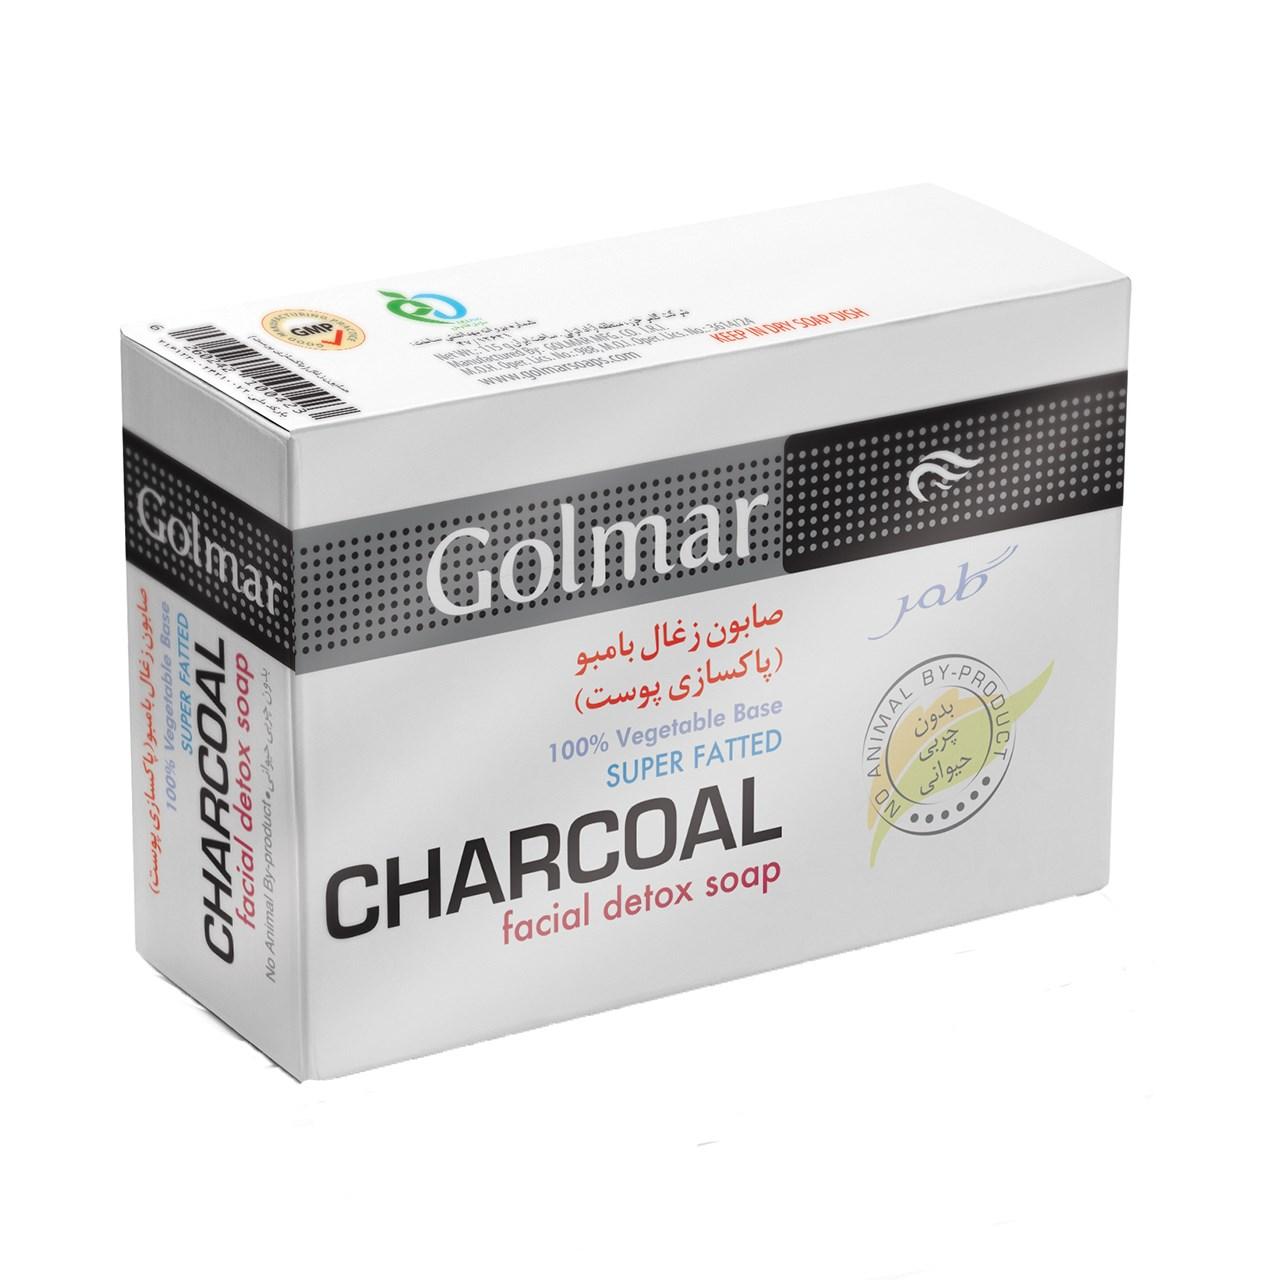 قیمت صابون زغال گلمر مدل Charcoal مقدار 115 گرم